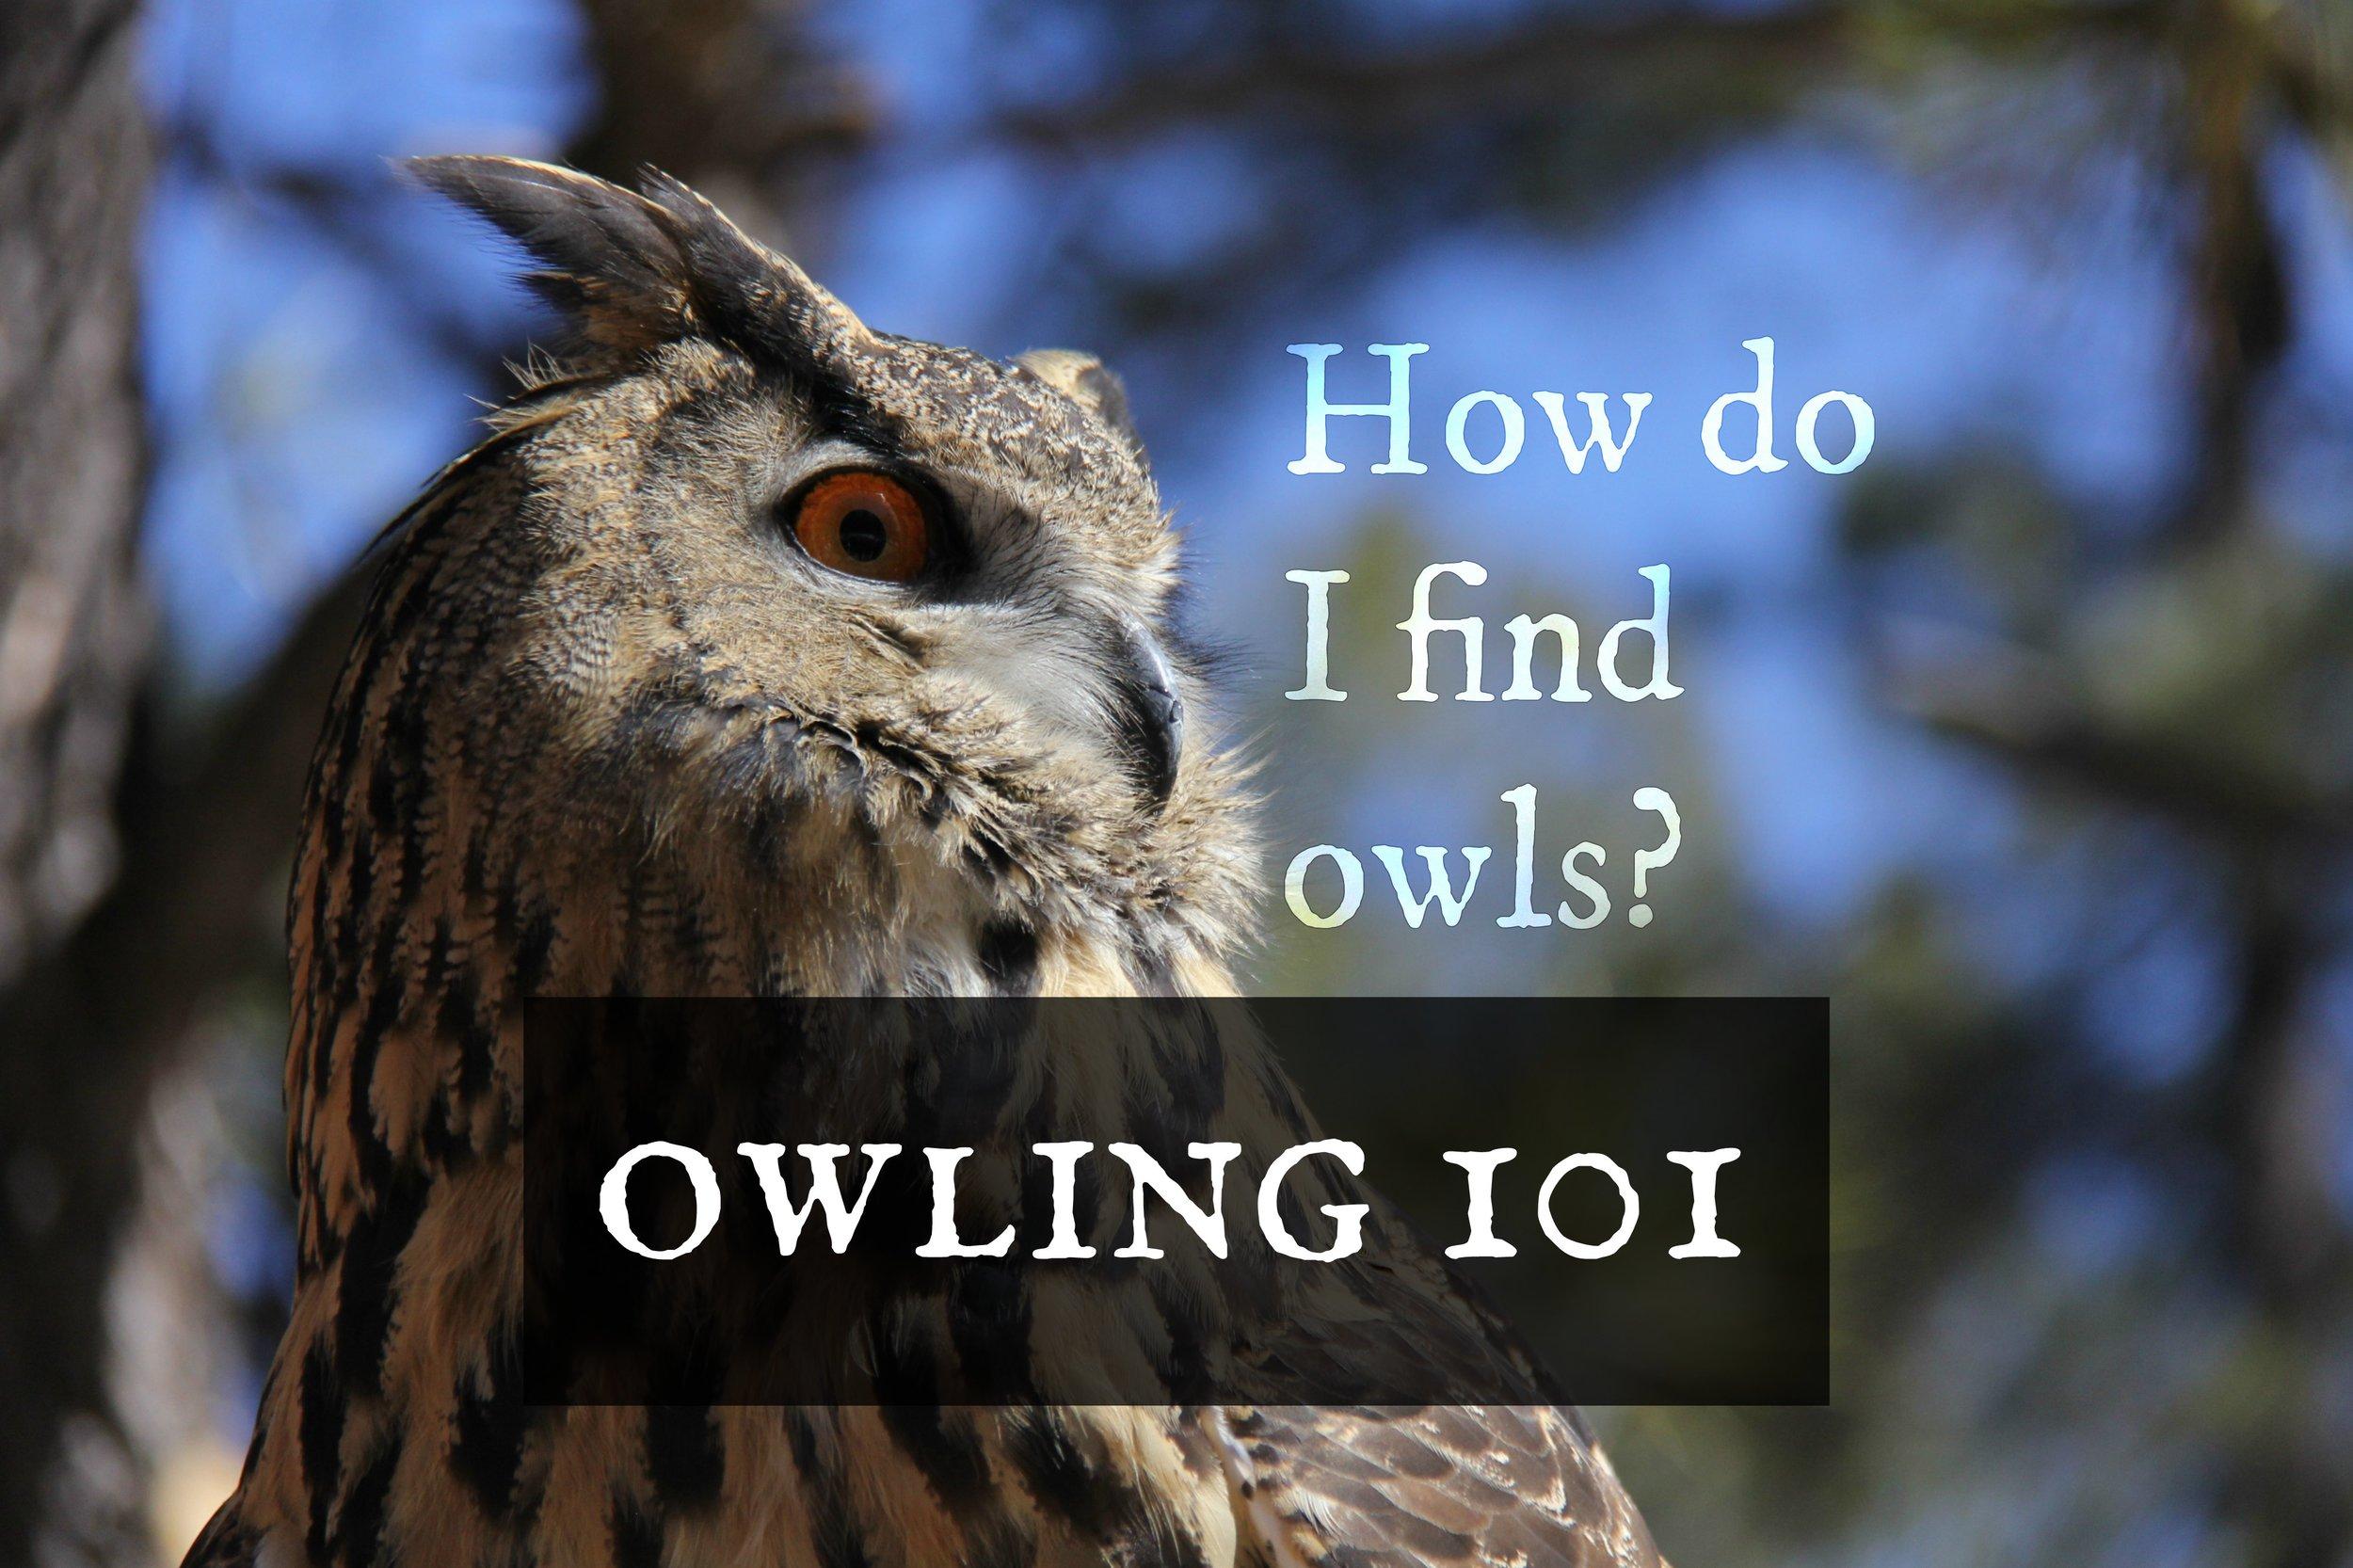 owling101-findingowls.jpg